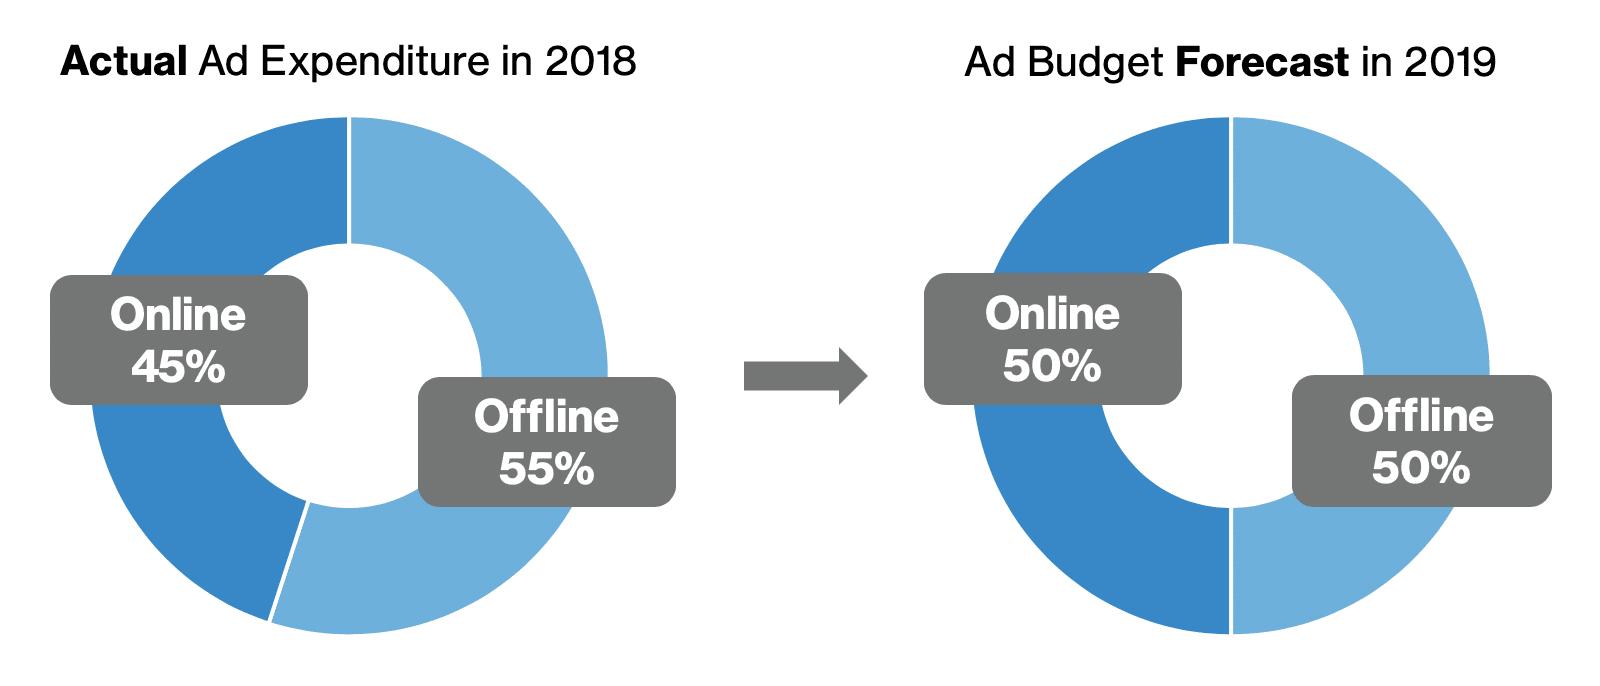 Ad Budget Forecast Comparison